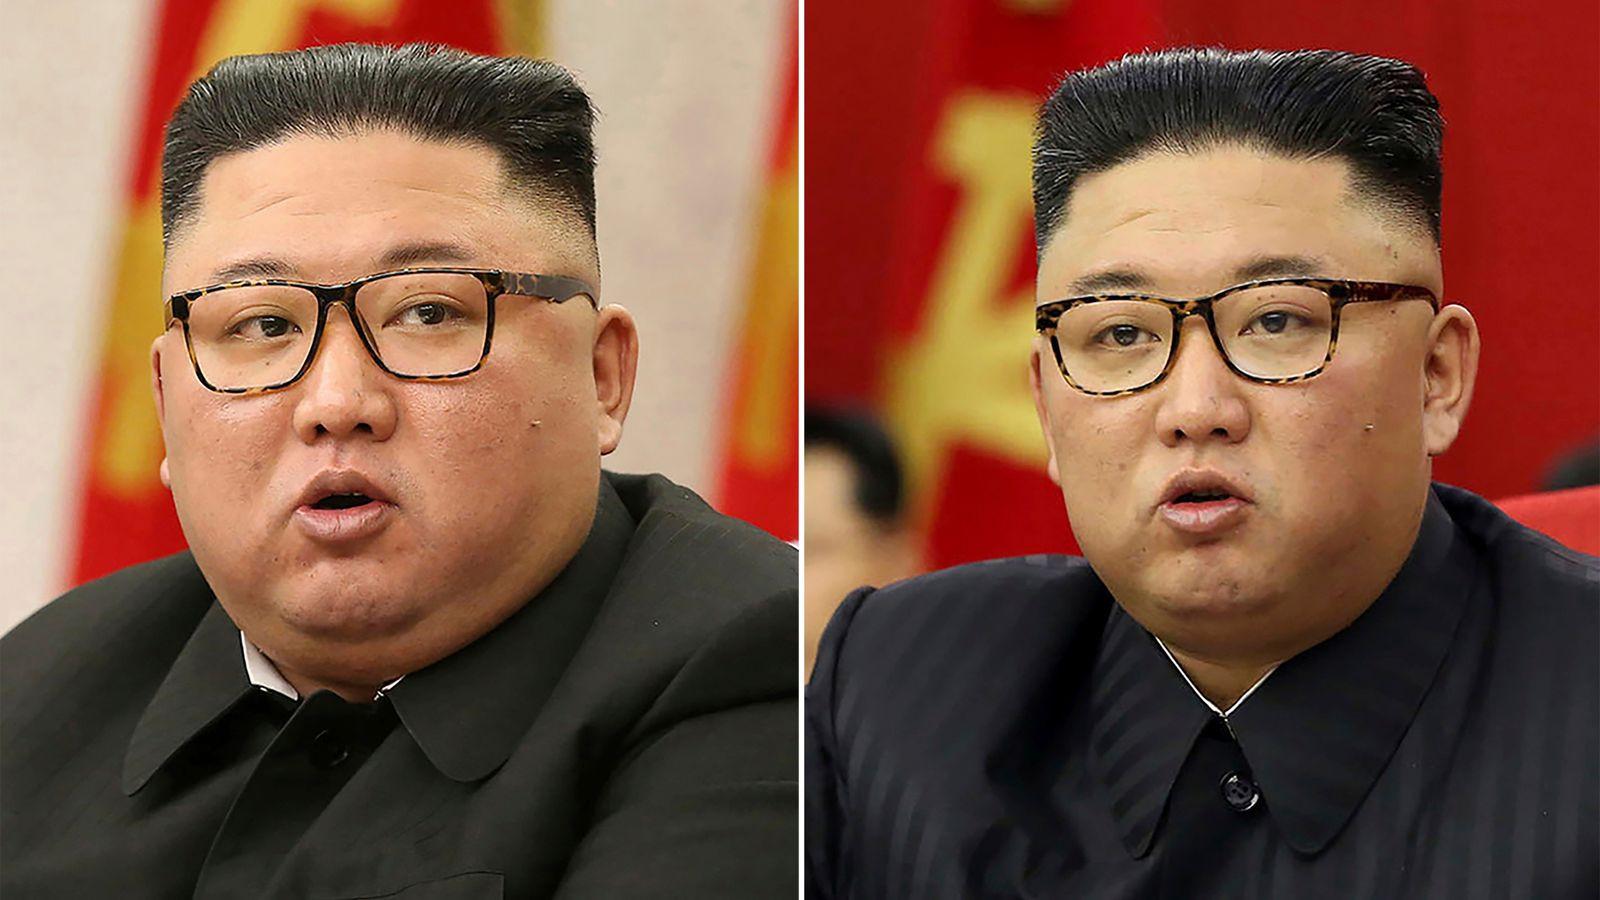 North Korean leader, Kim Jong Un